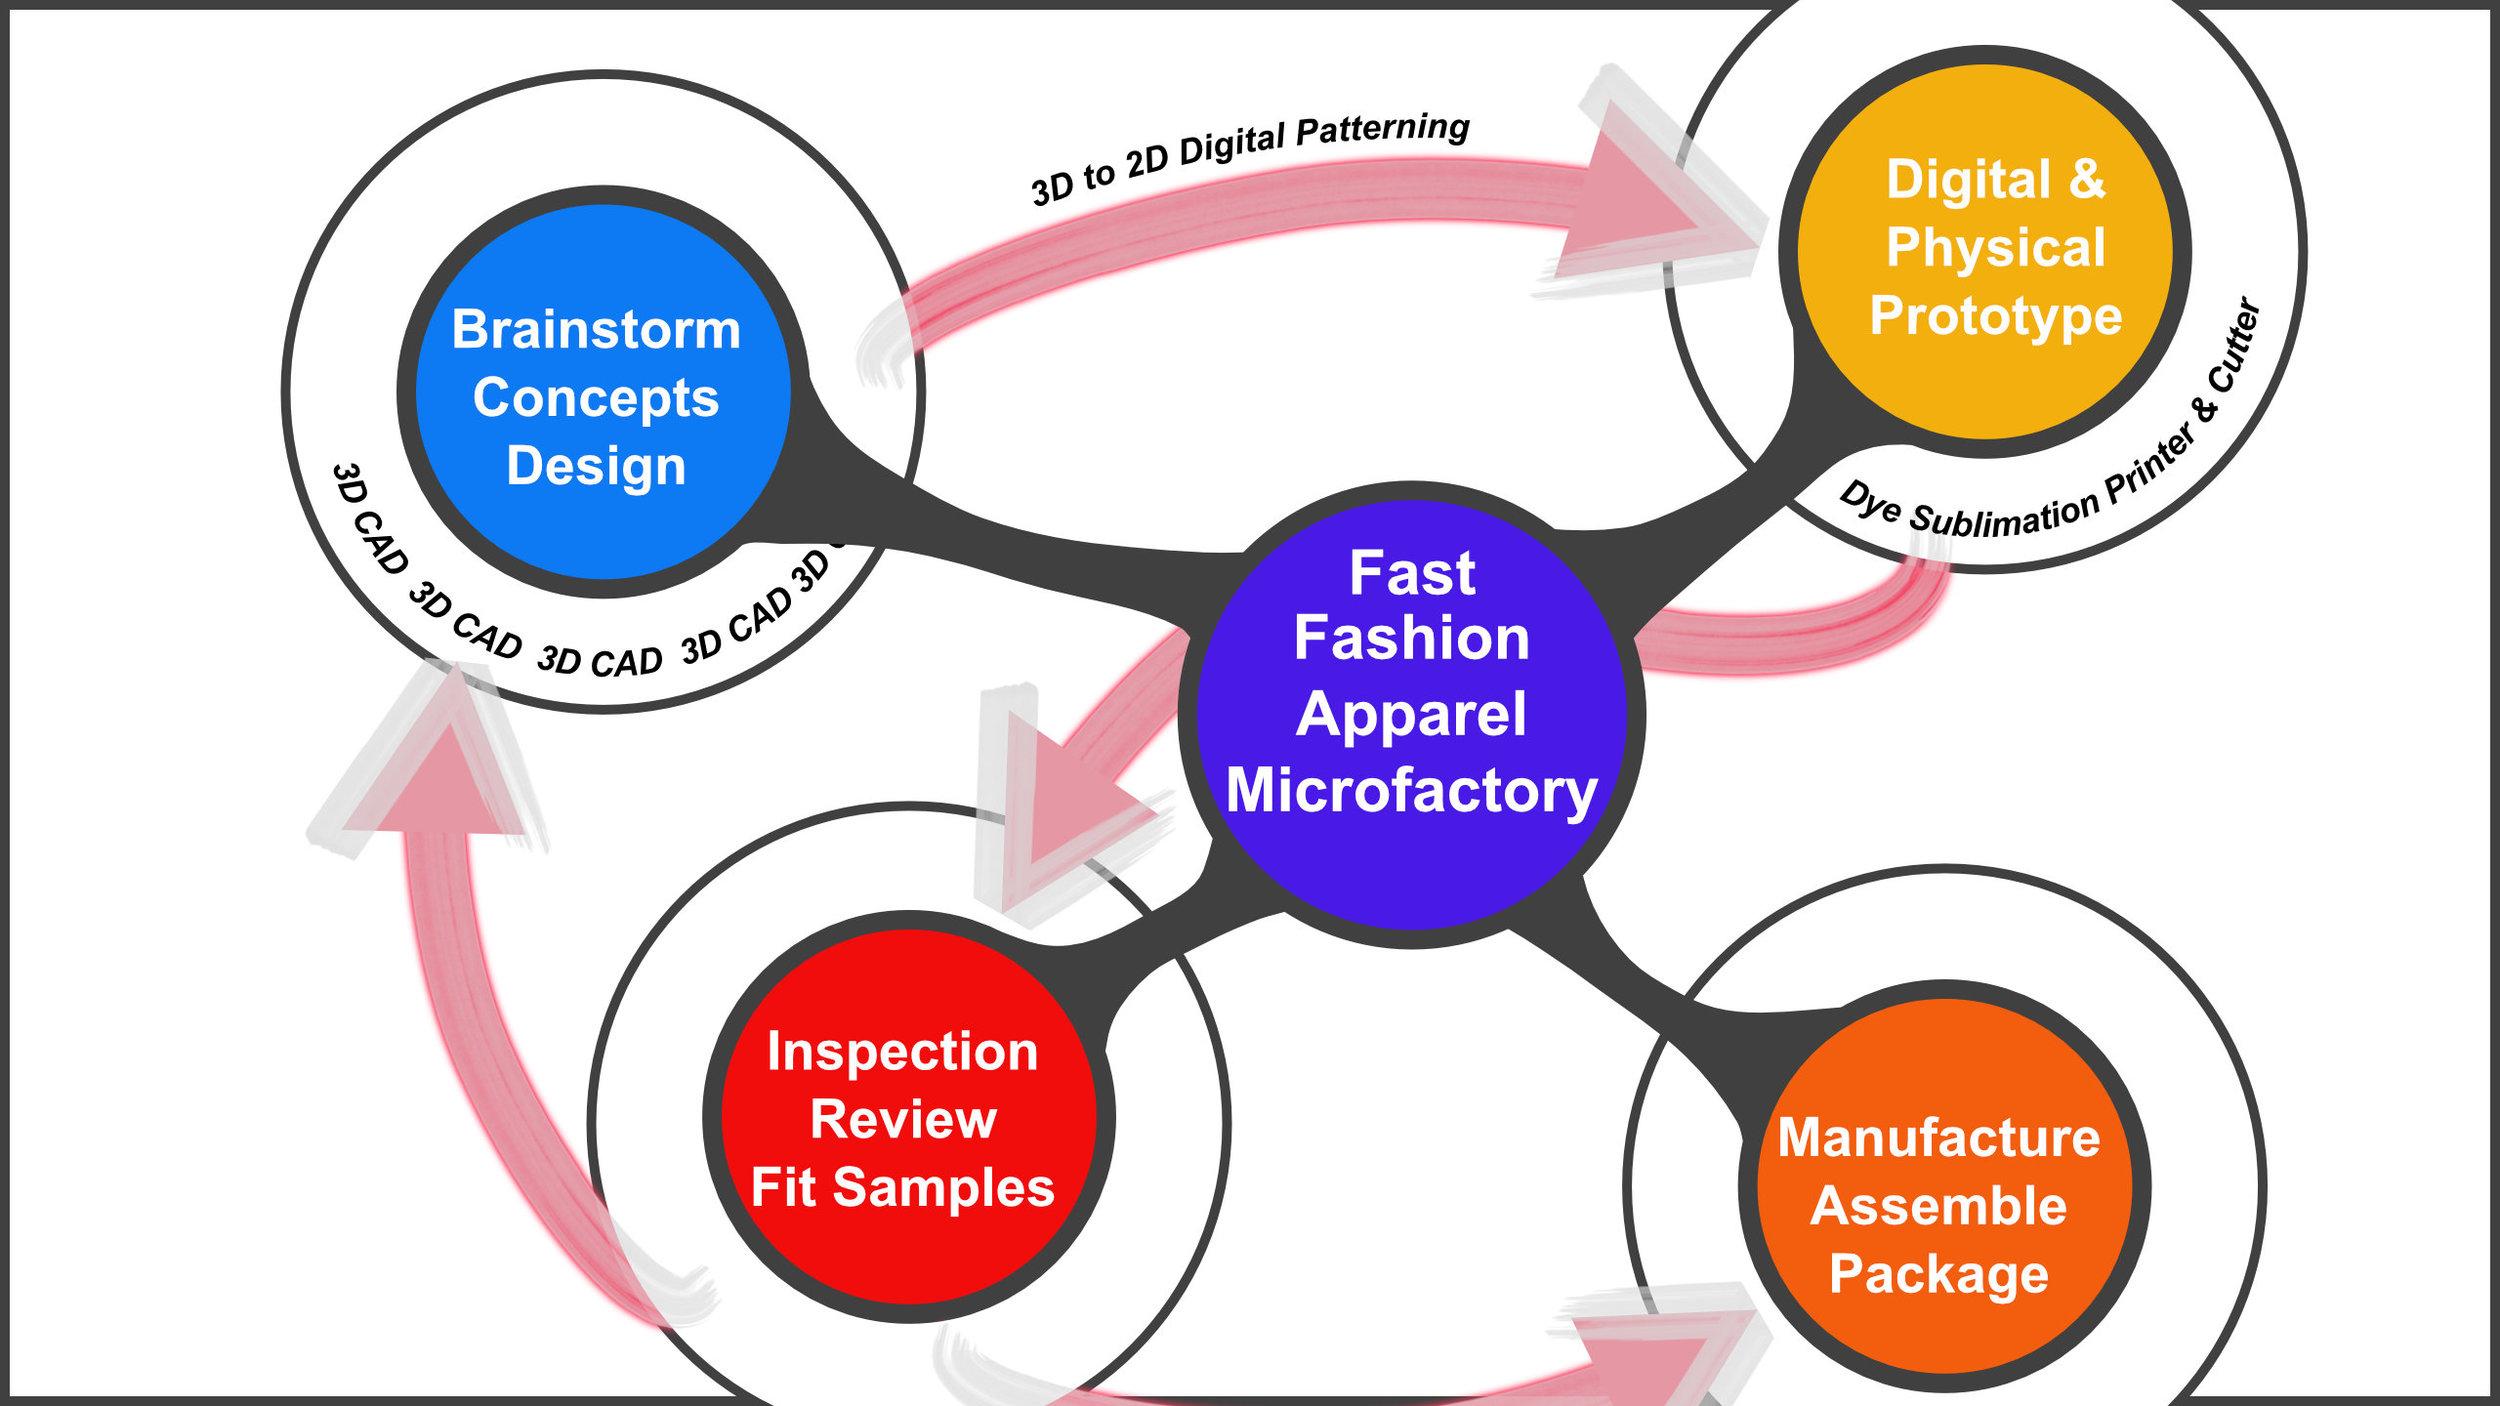 Apparel microfactory design.jpg